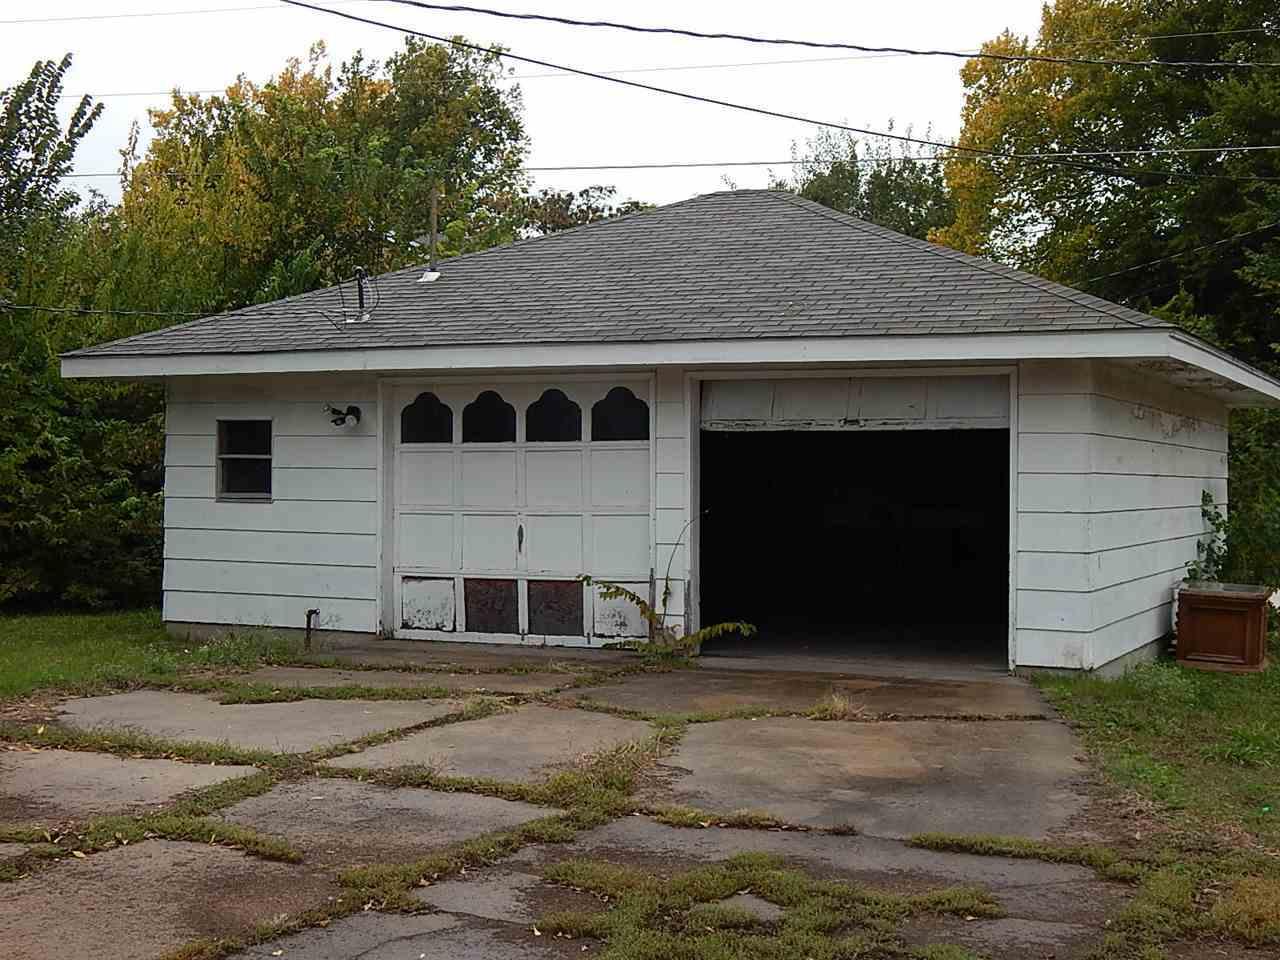 Sold Cross Sale W/ MLS | 414 N Palm Ponca City, OK 74601 8